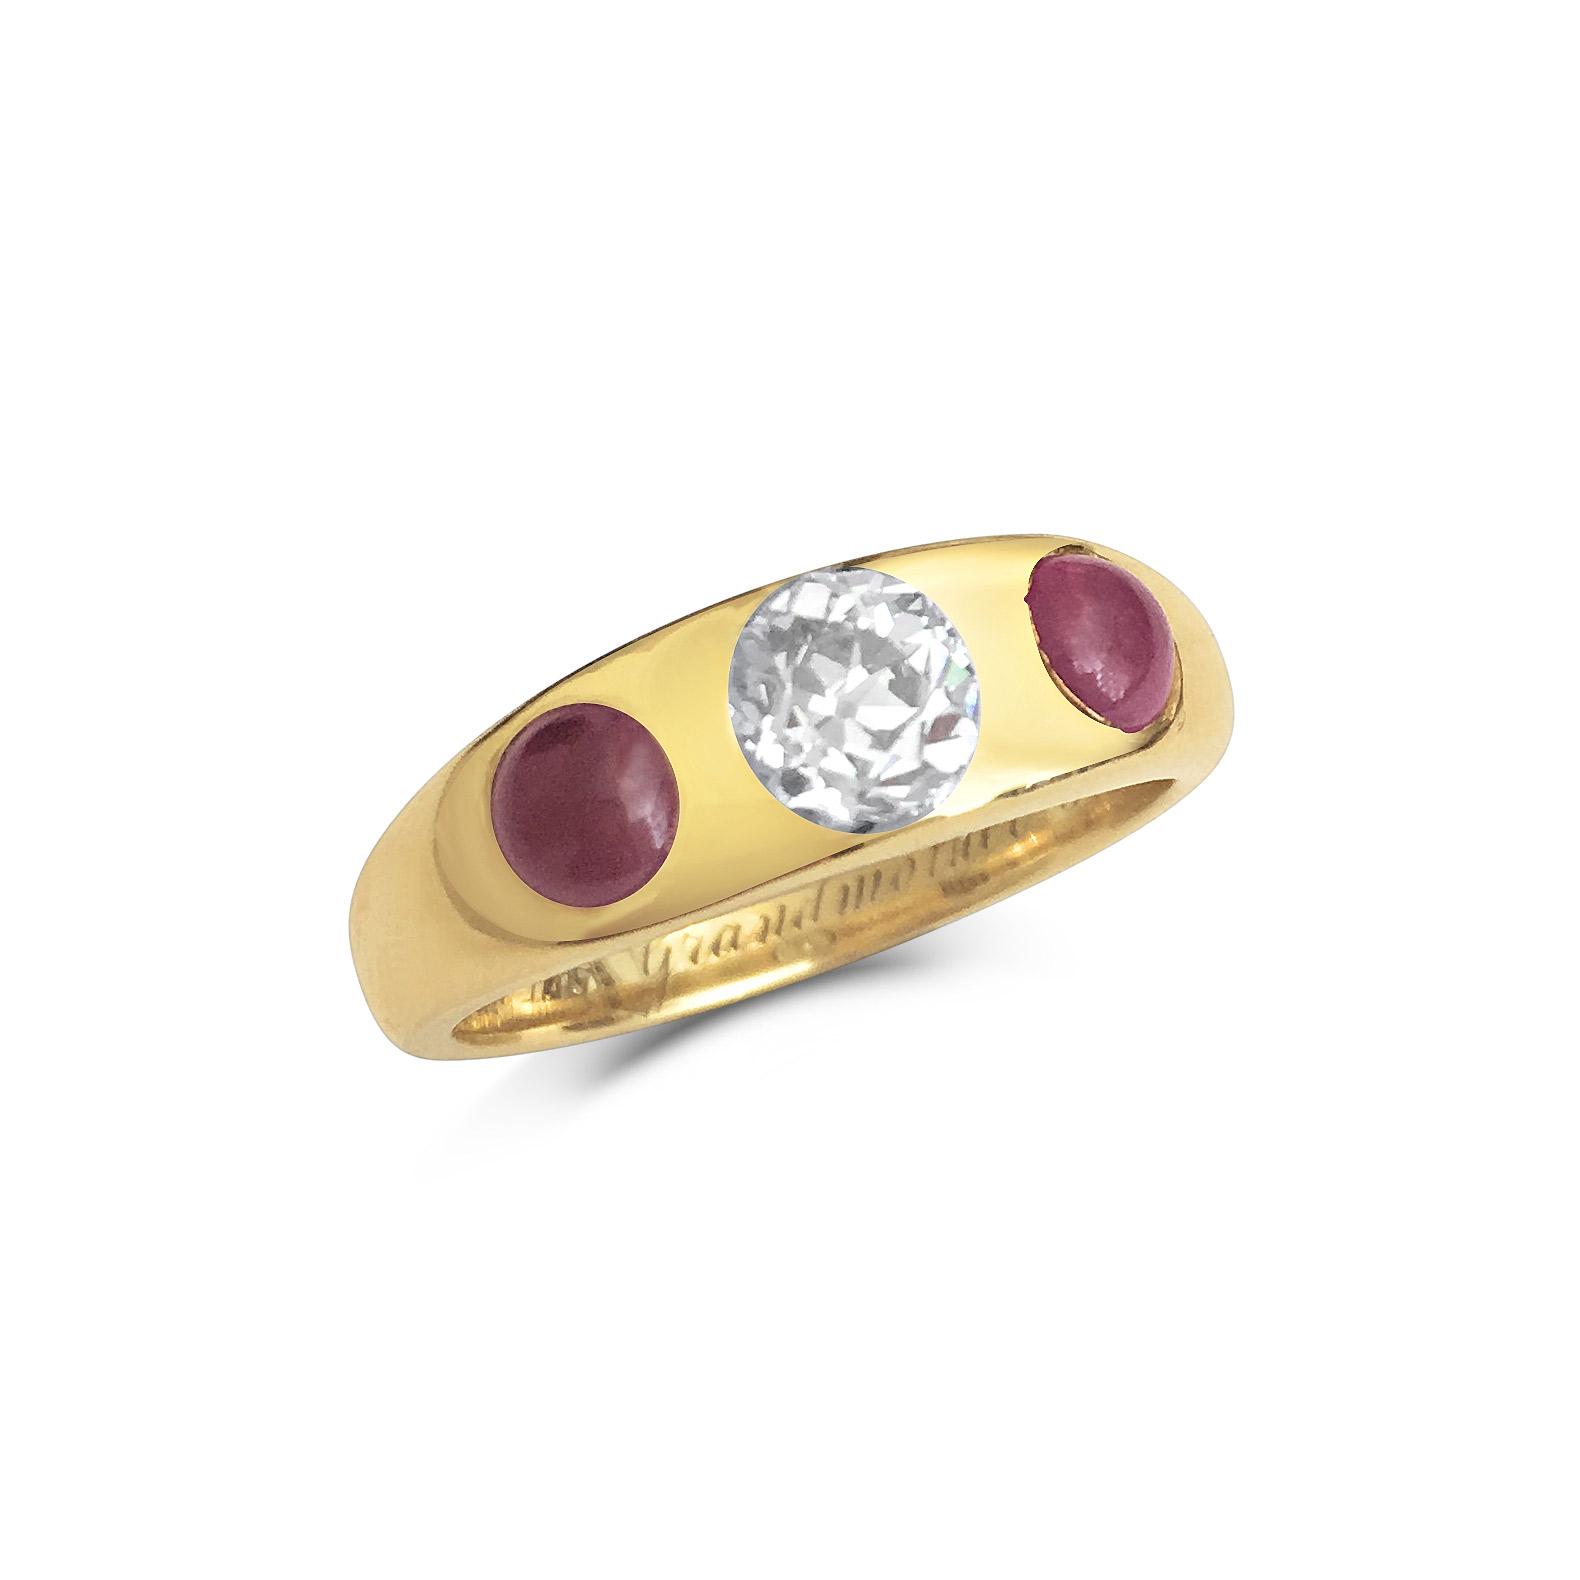 Ruby and diamond gypsy ring